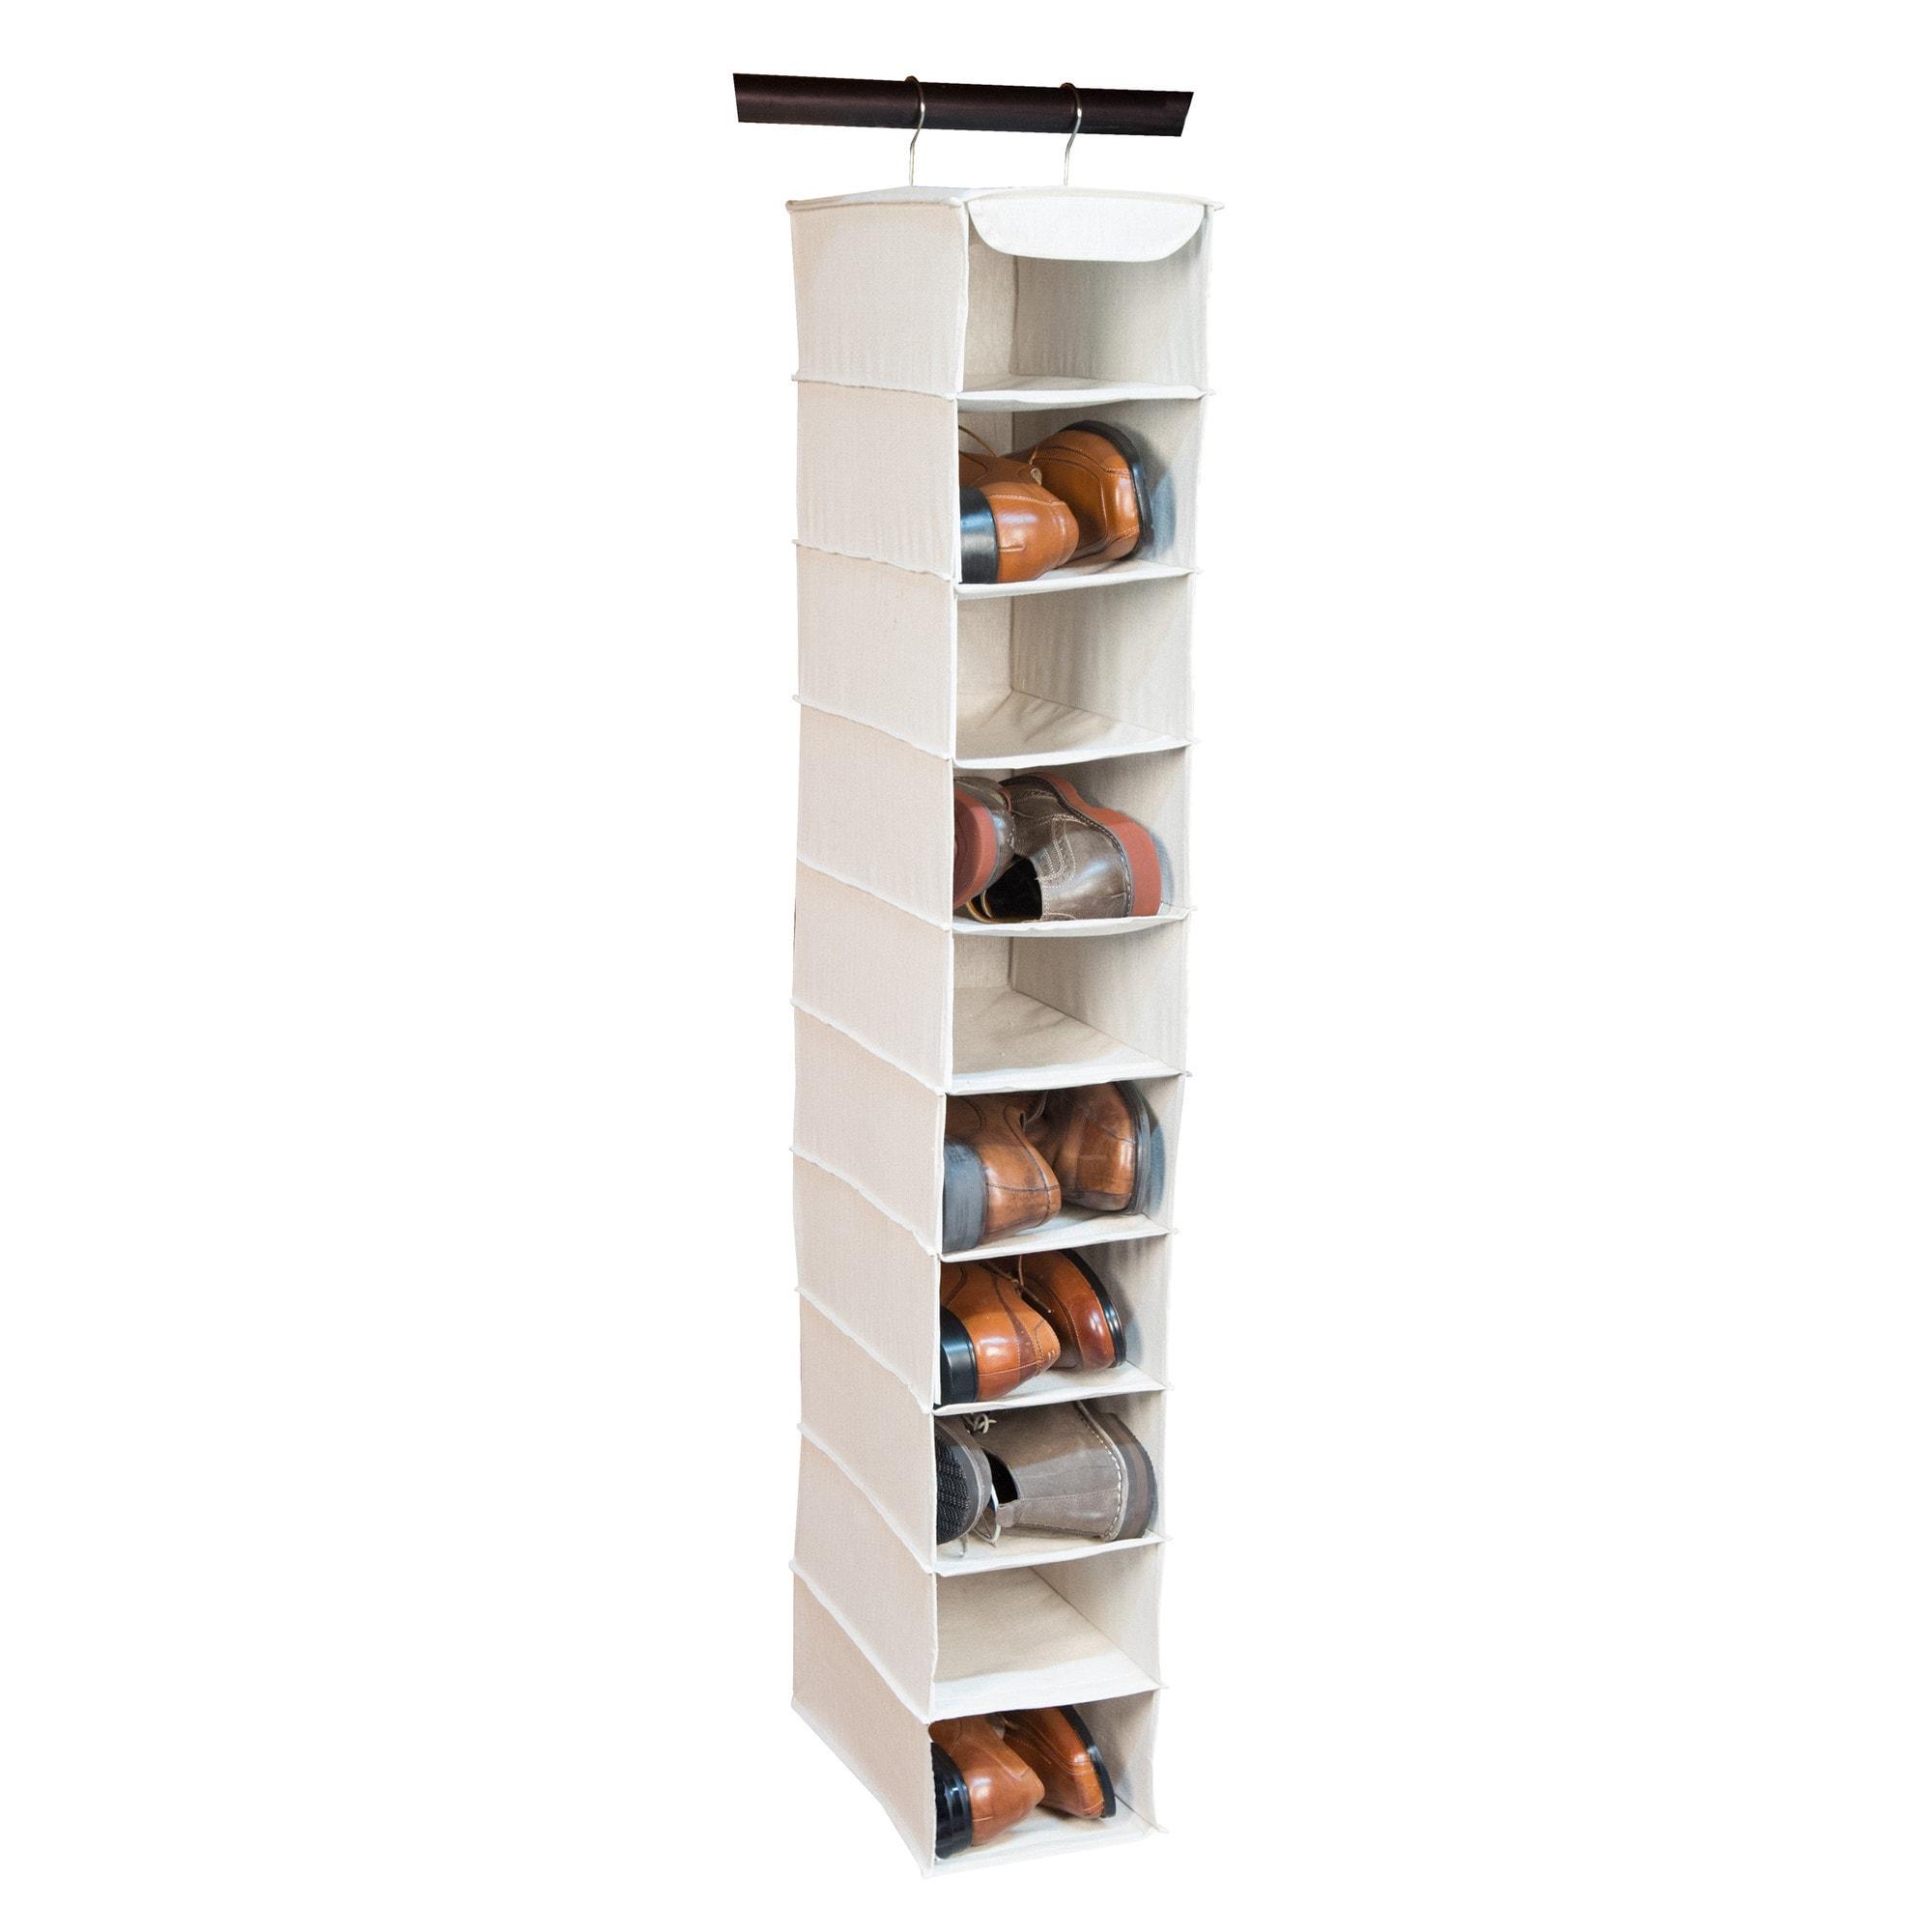 Richards Homewares Nature of Storage Canvas 10-shelf Men's Shoe Organizer